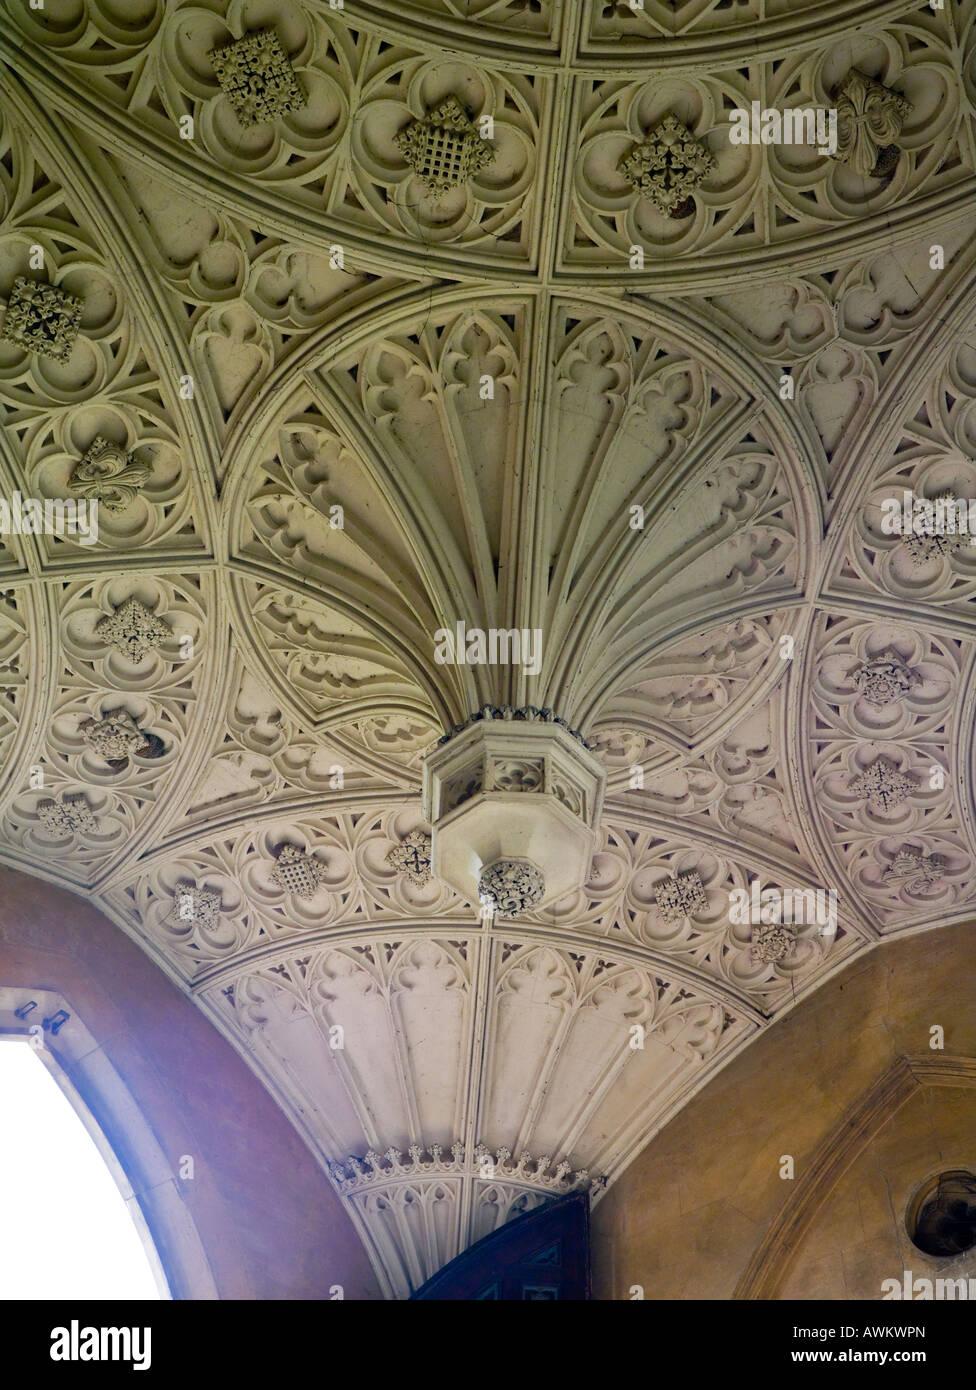 The New Court, St John's College, Cambridge, England, UK - Stock Image